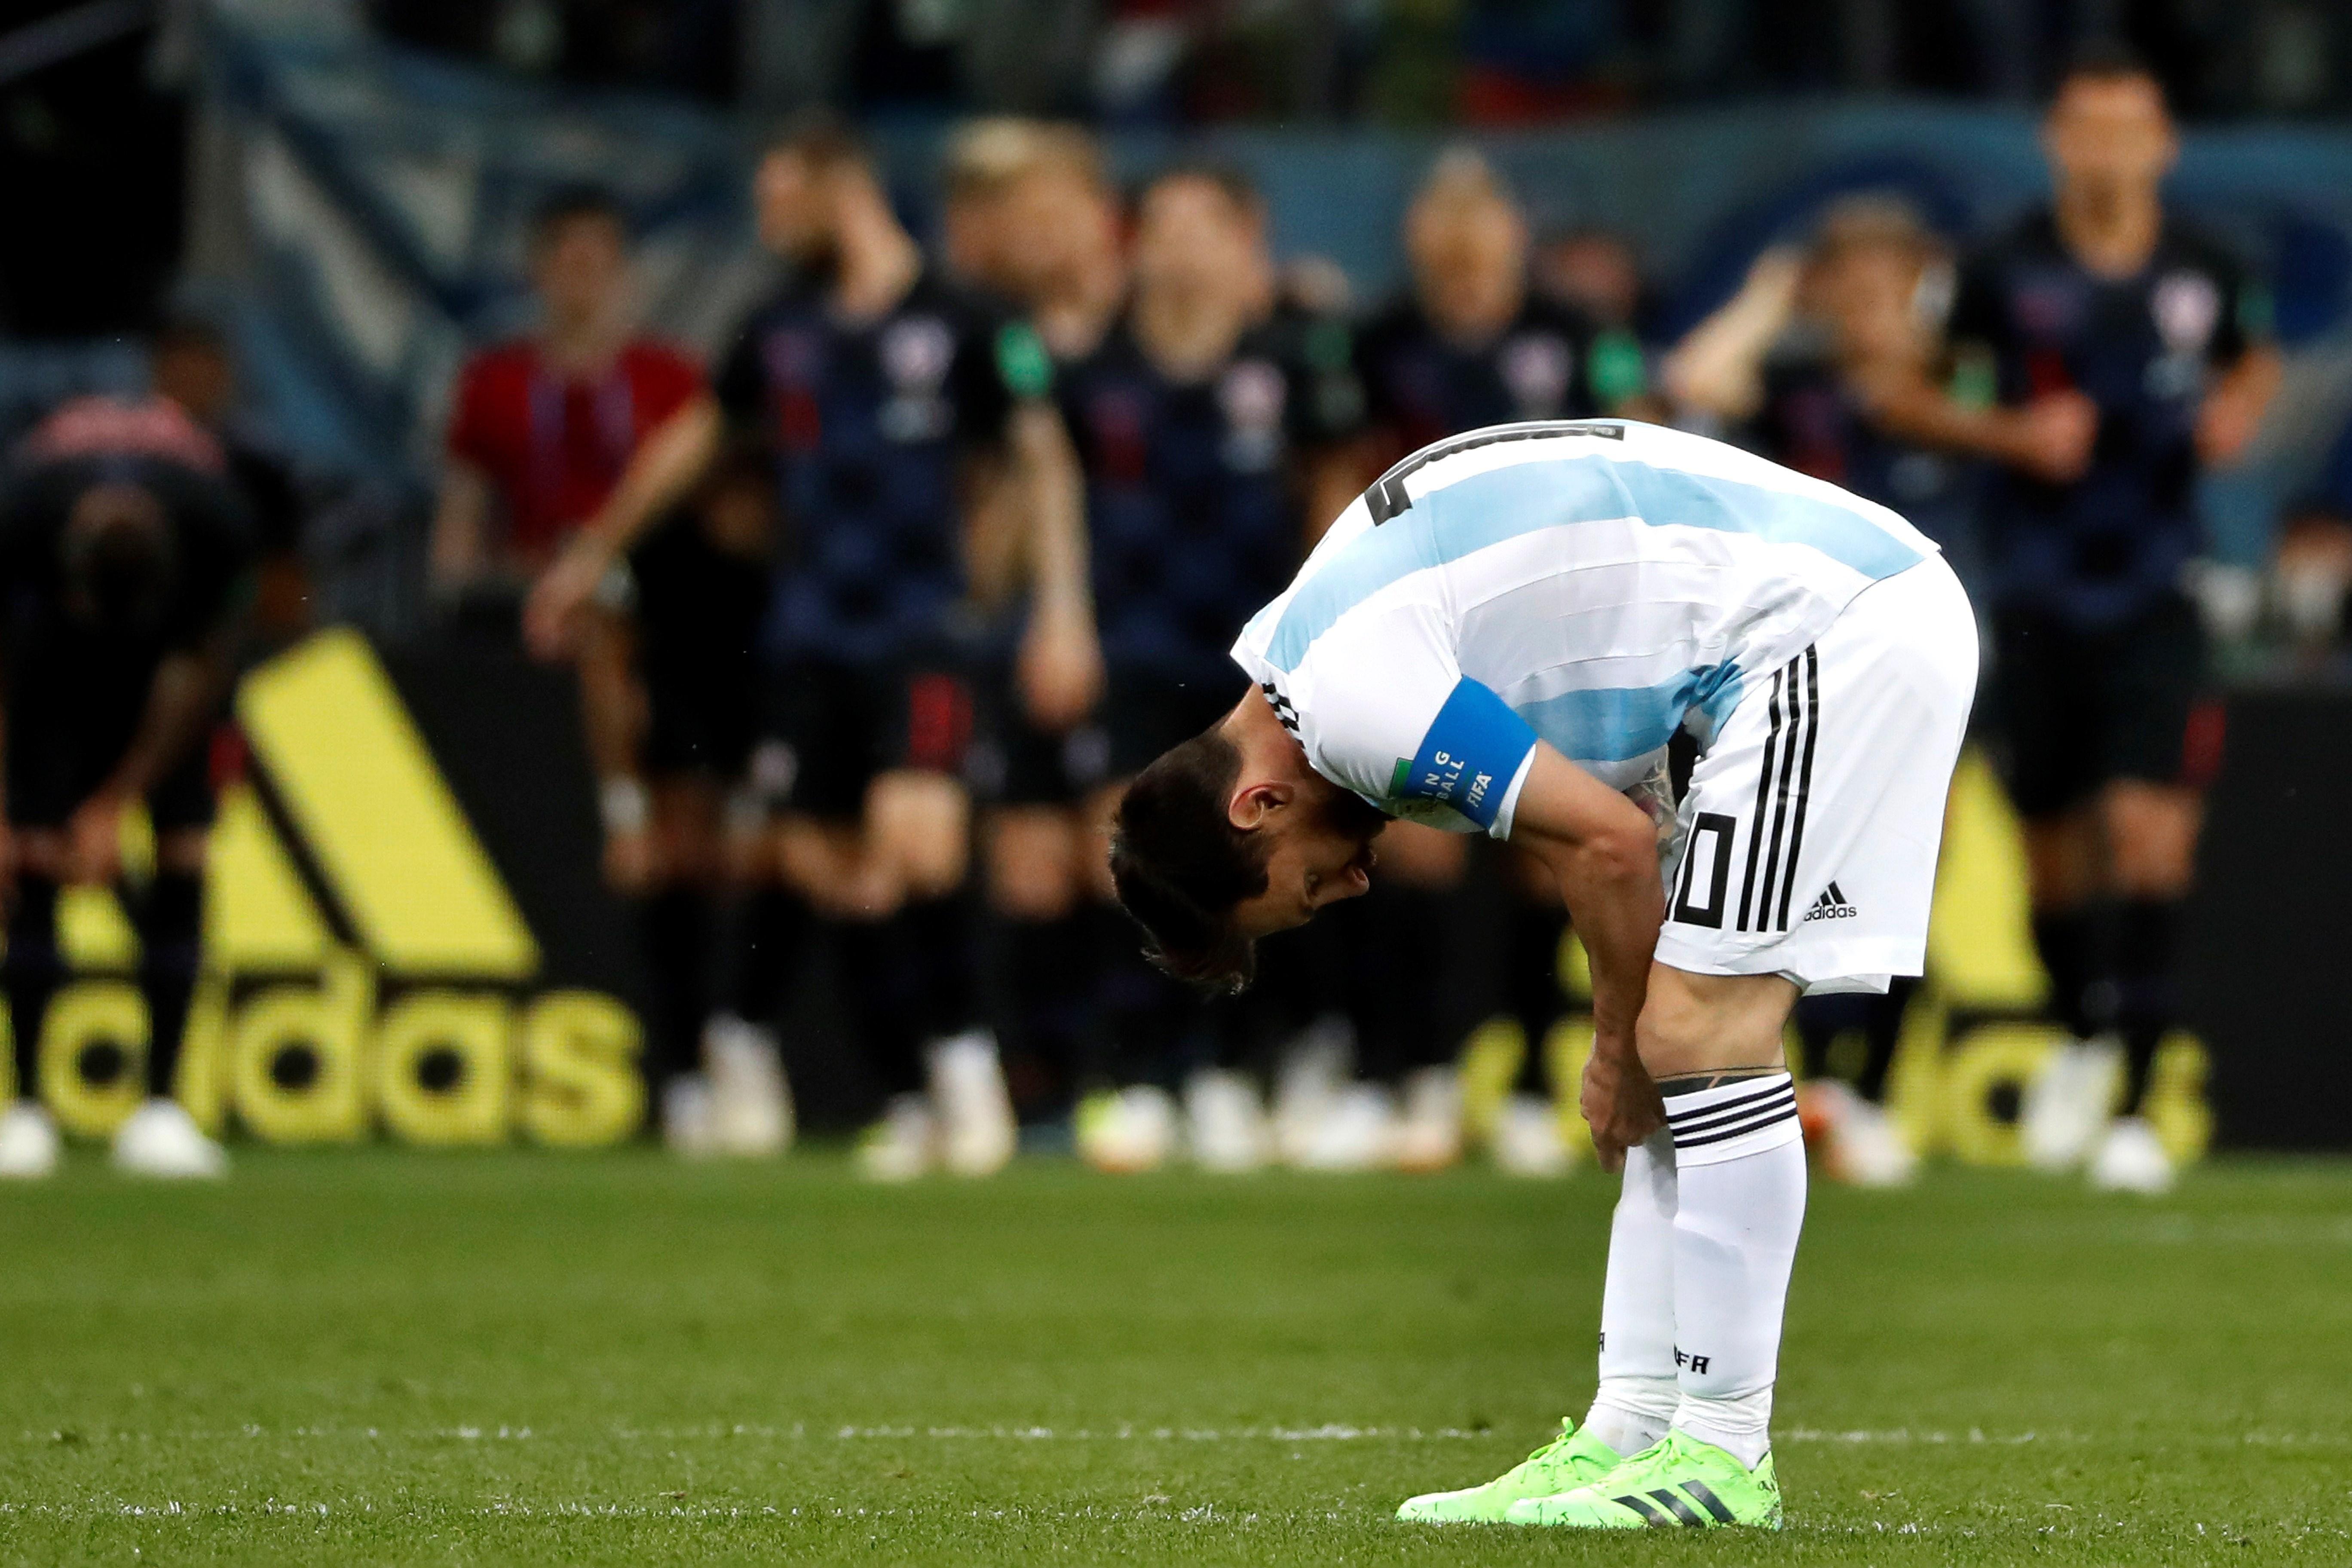 Messi mostró un nivel muy bajo en el Mundial. Foto: EFE